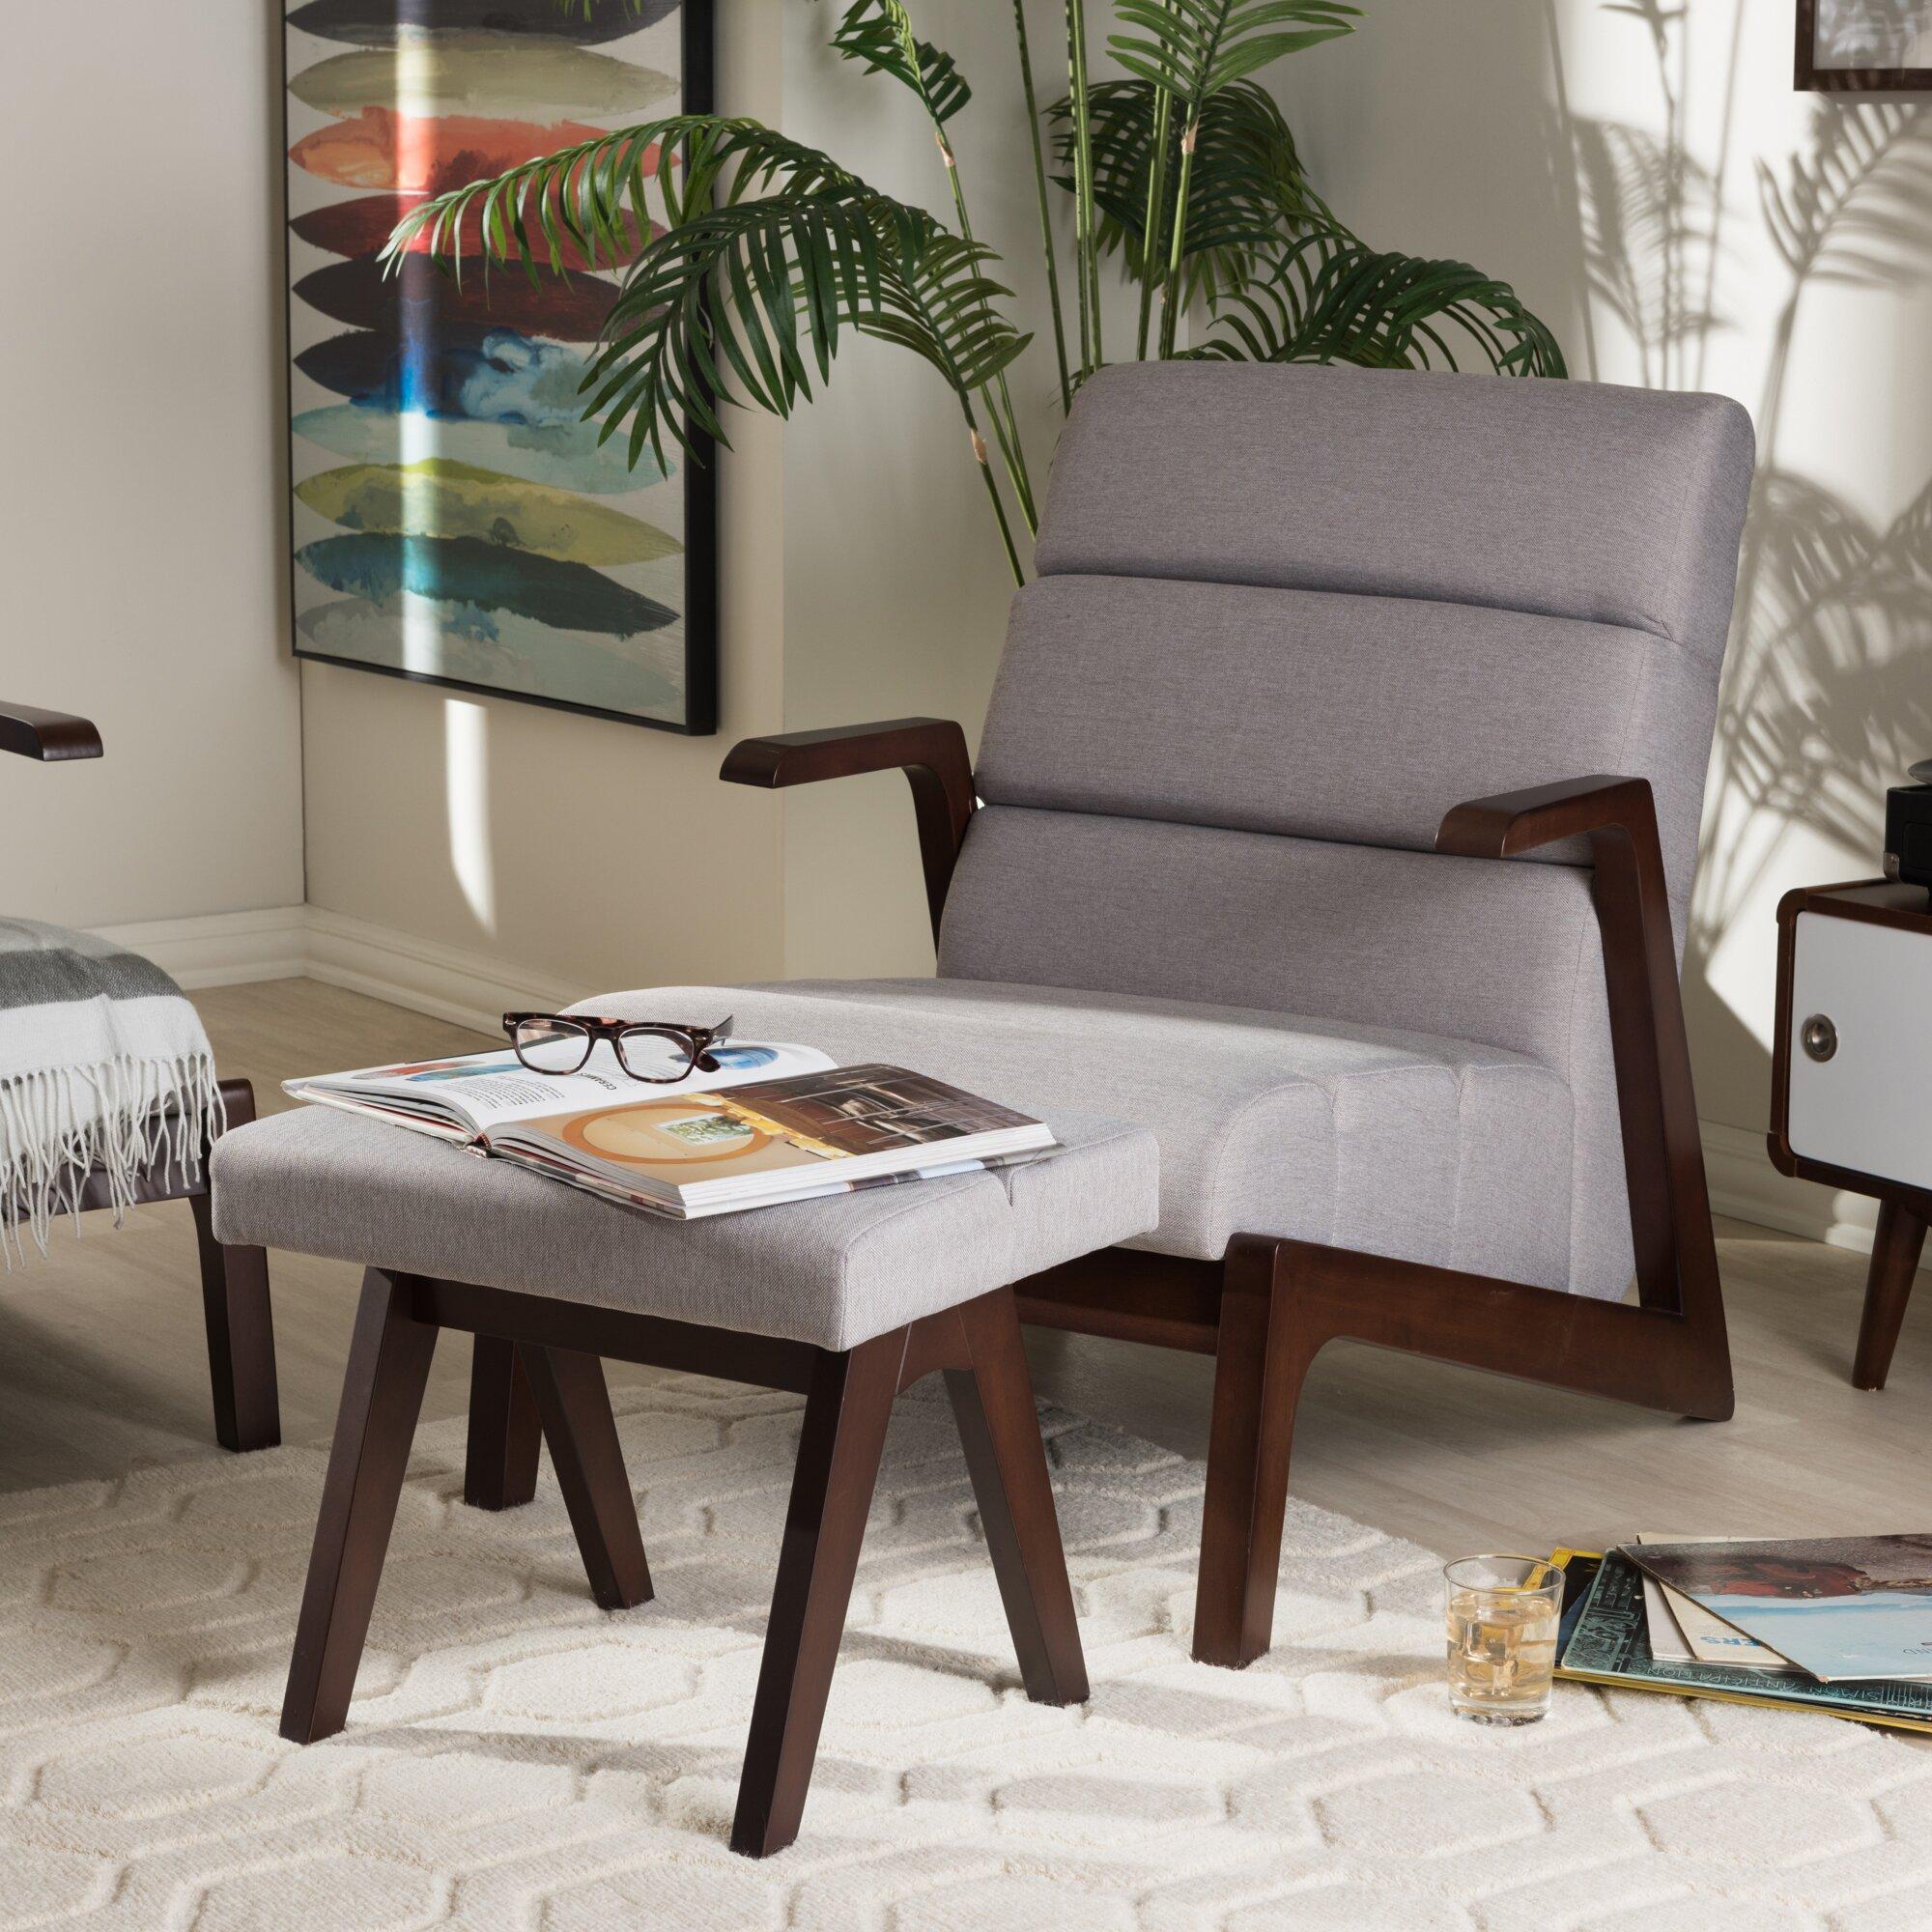 Lounge Chair Living Room Modern Lounge Chairs For Living Room Field Lounge Chair Nv Nice